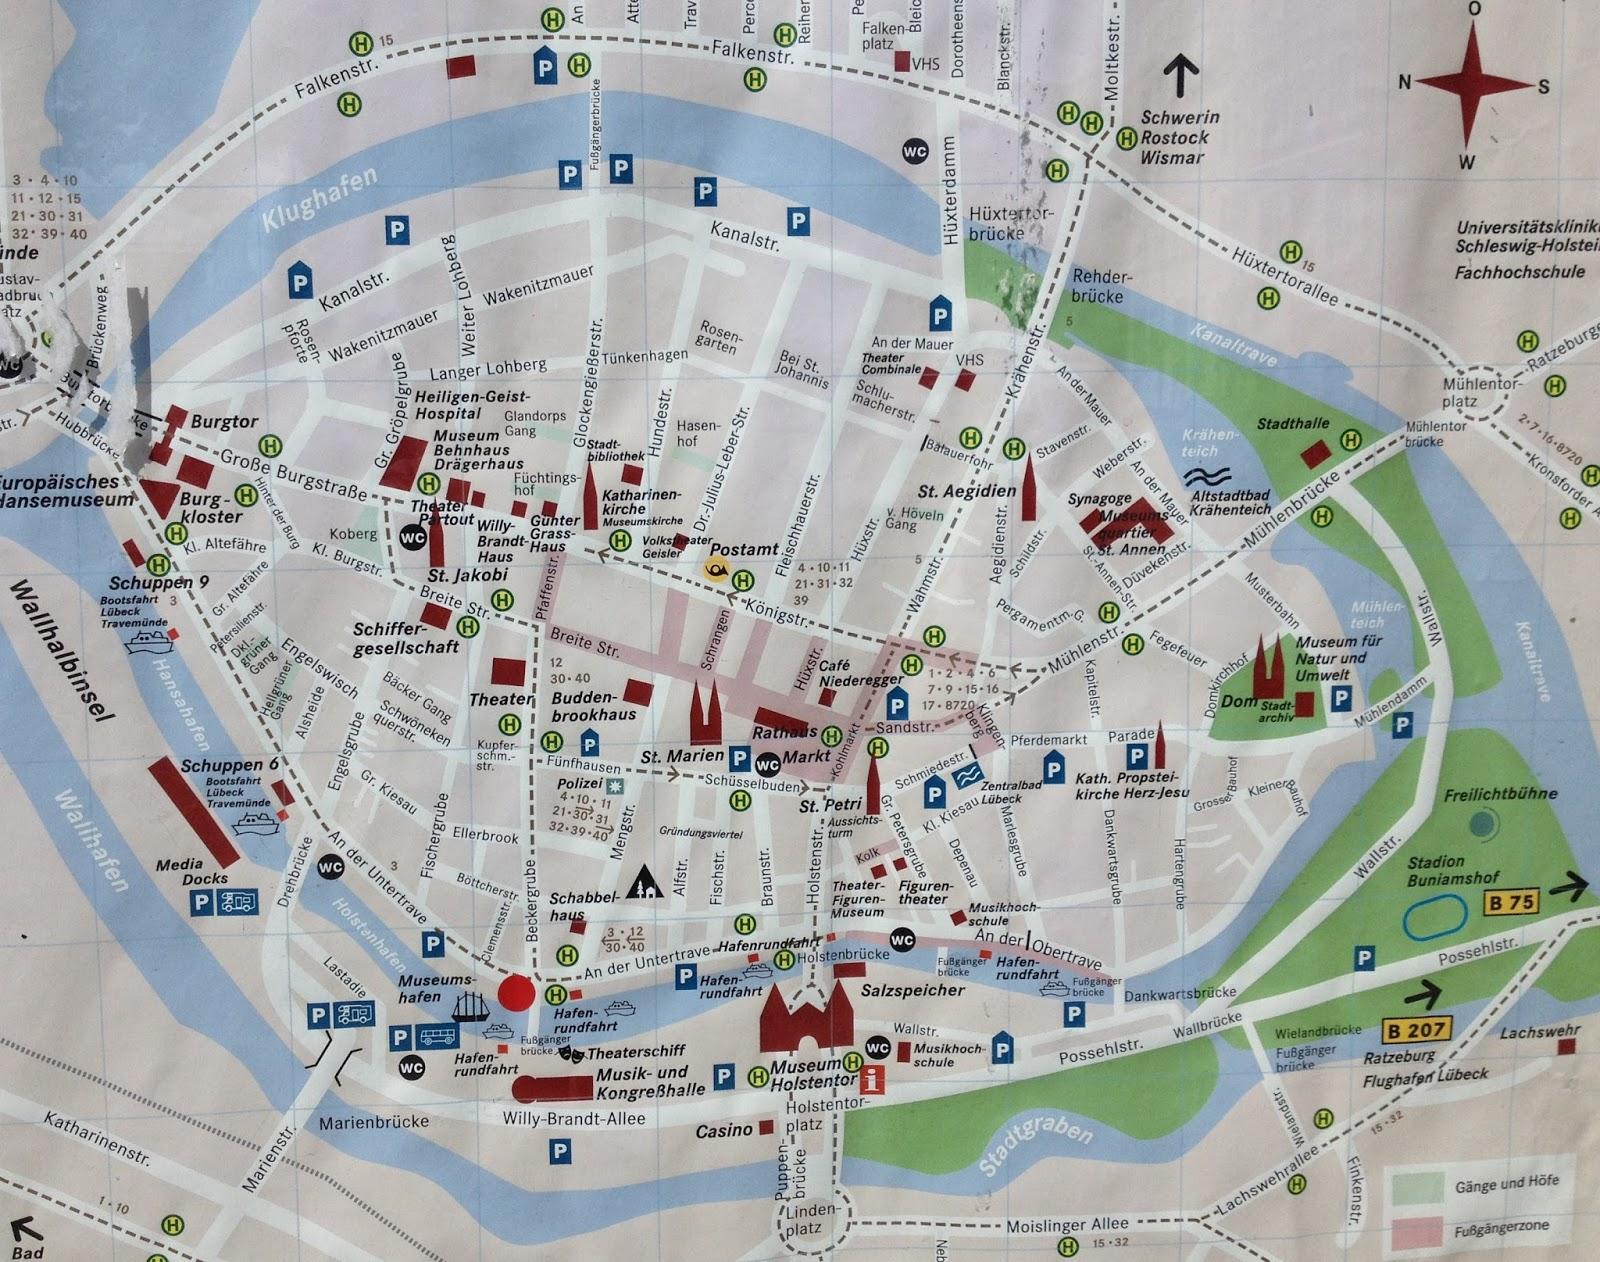 kart over krakow grápson ὃ βλέπεις γράψον εἰς βιβλίον: Krakow, Bastei, Berlin  kart over krakow